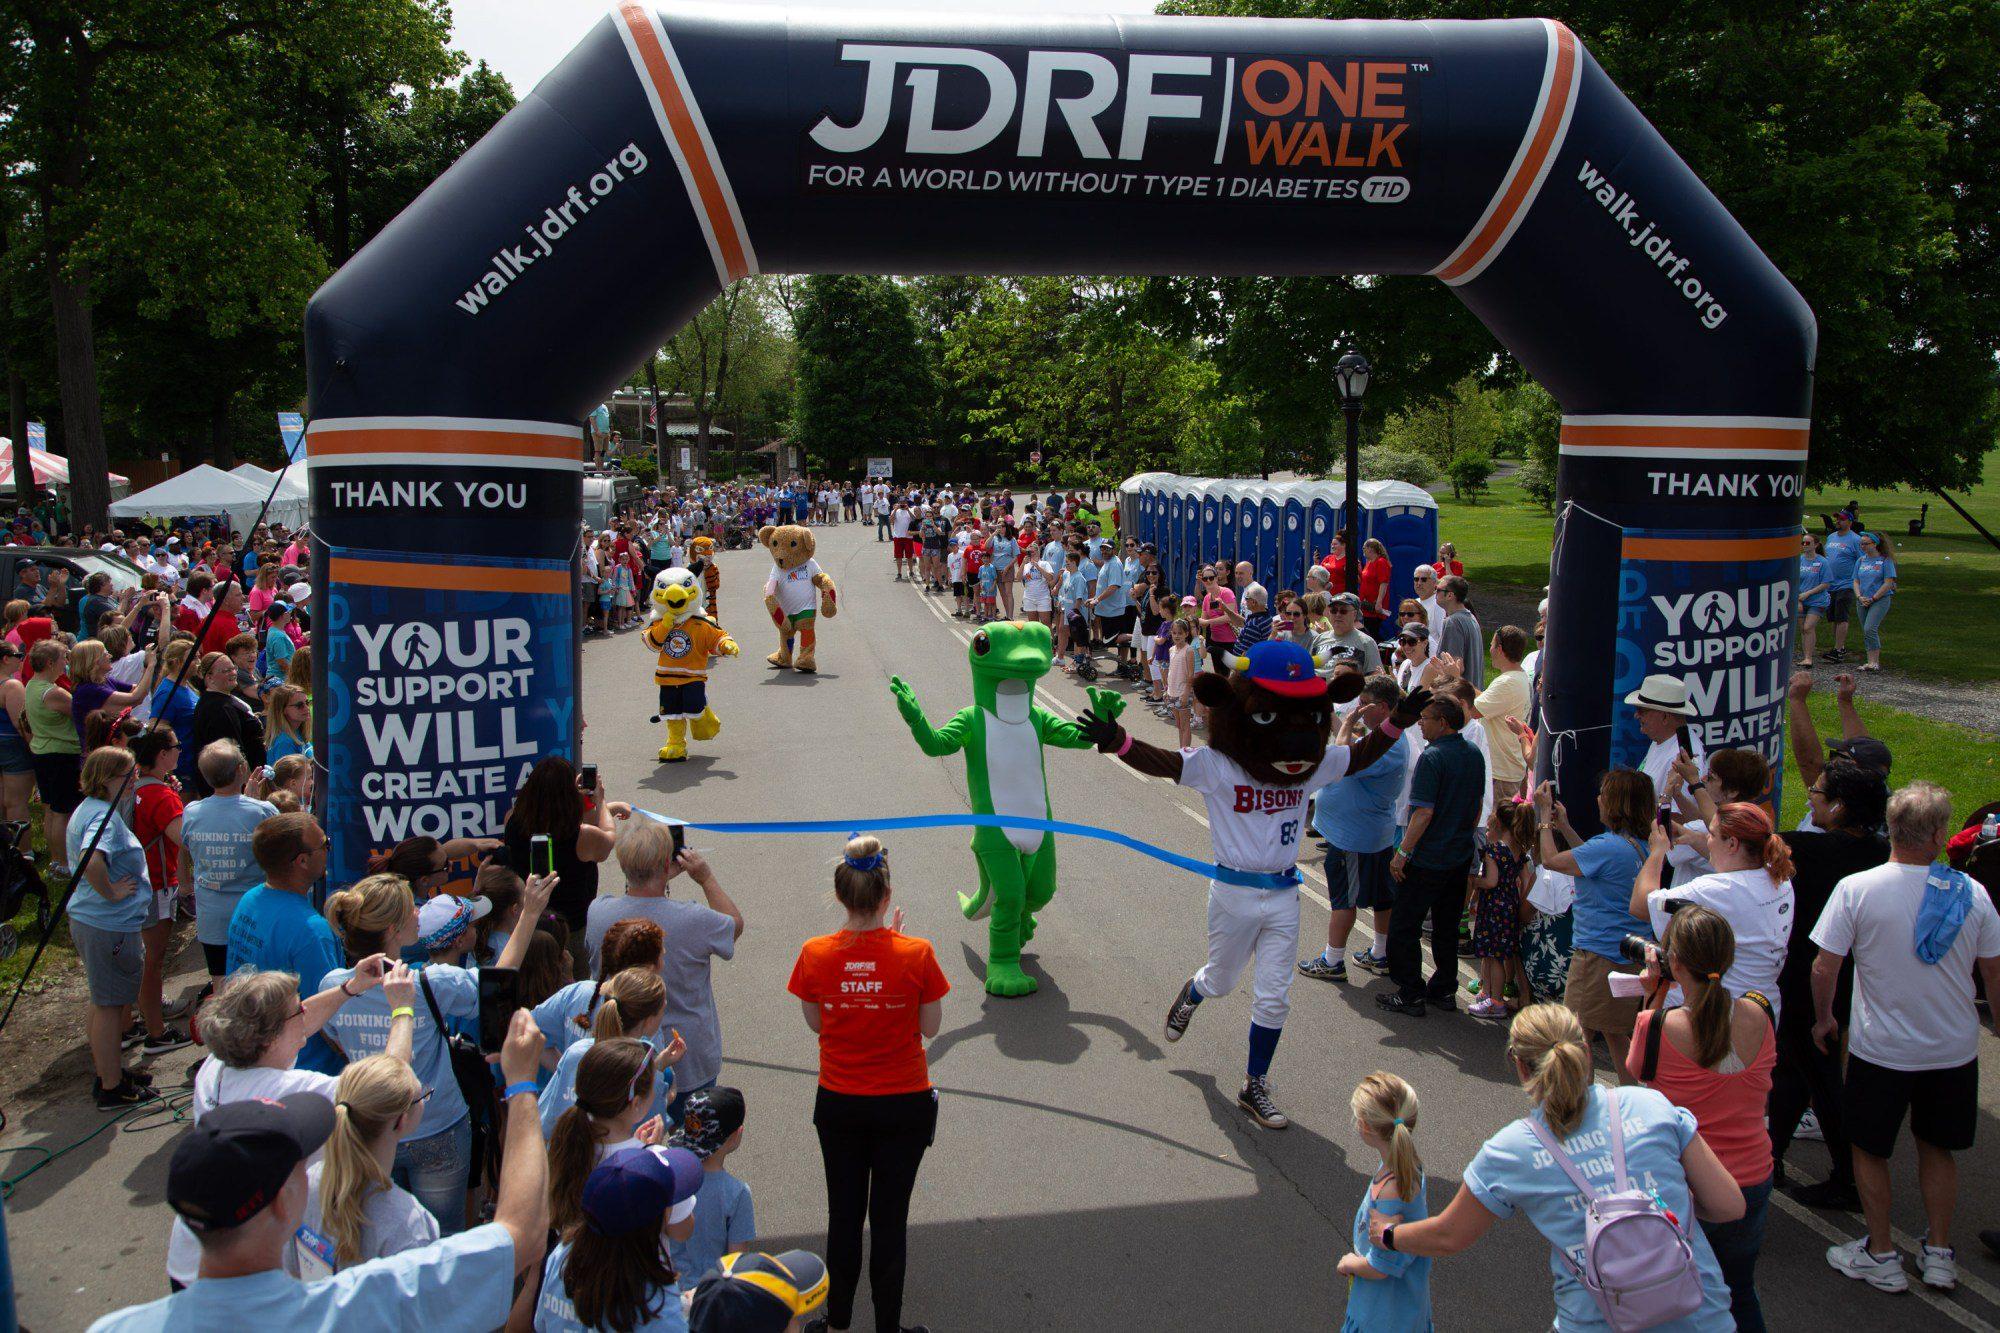 JDRF-One-Walk-7_1560107390597_91445427_ver1.0